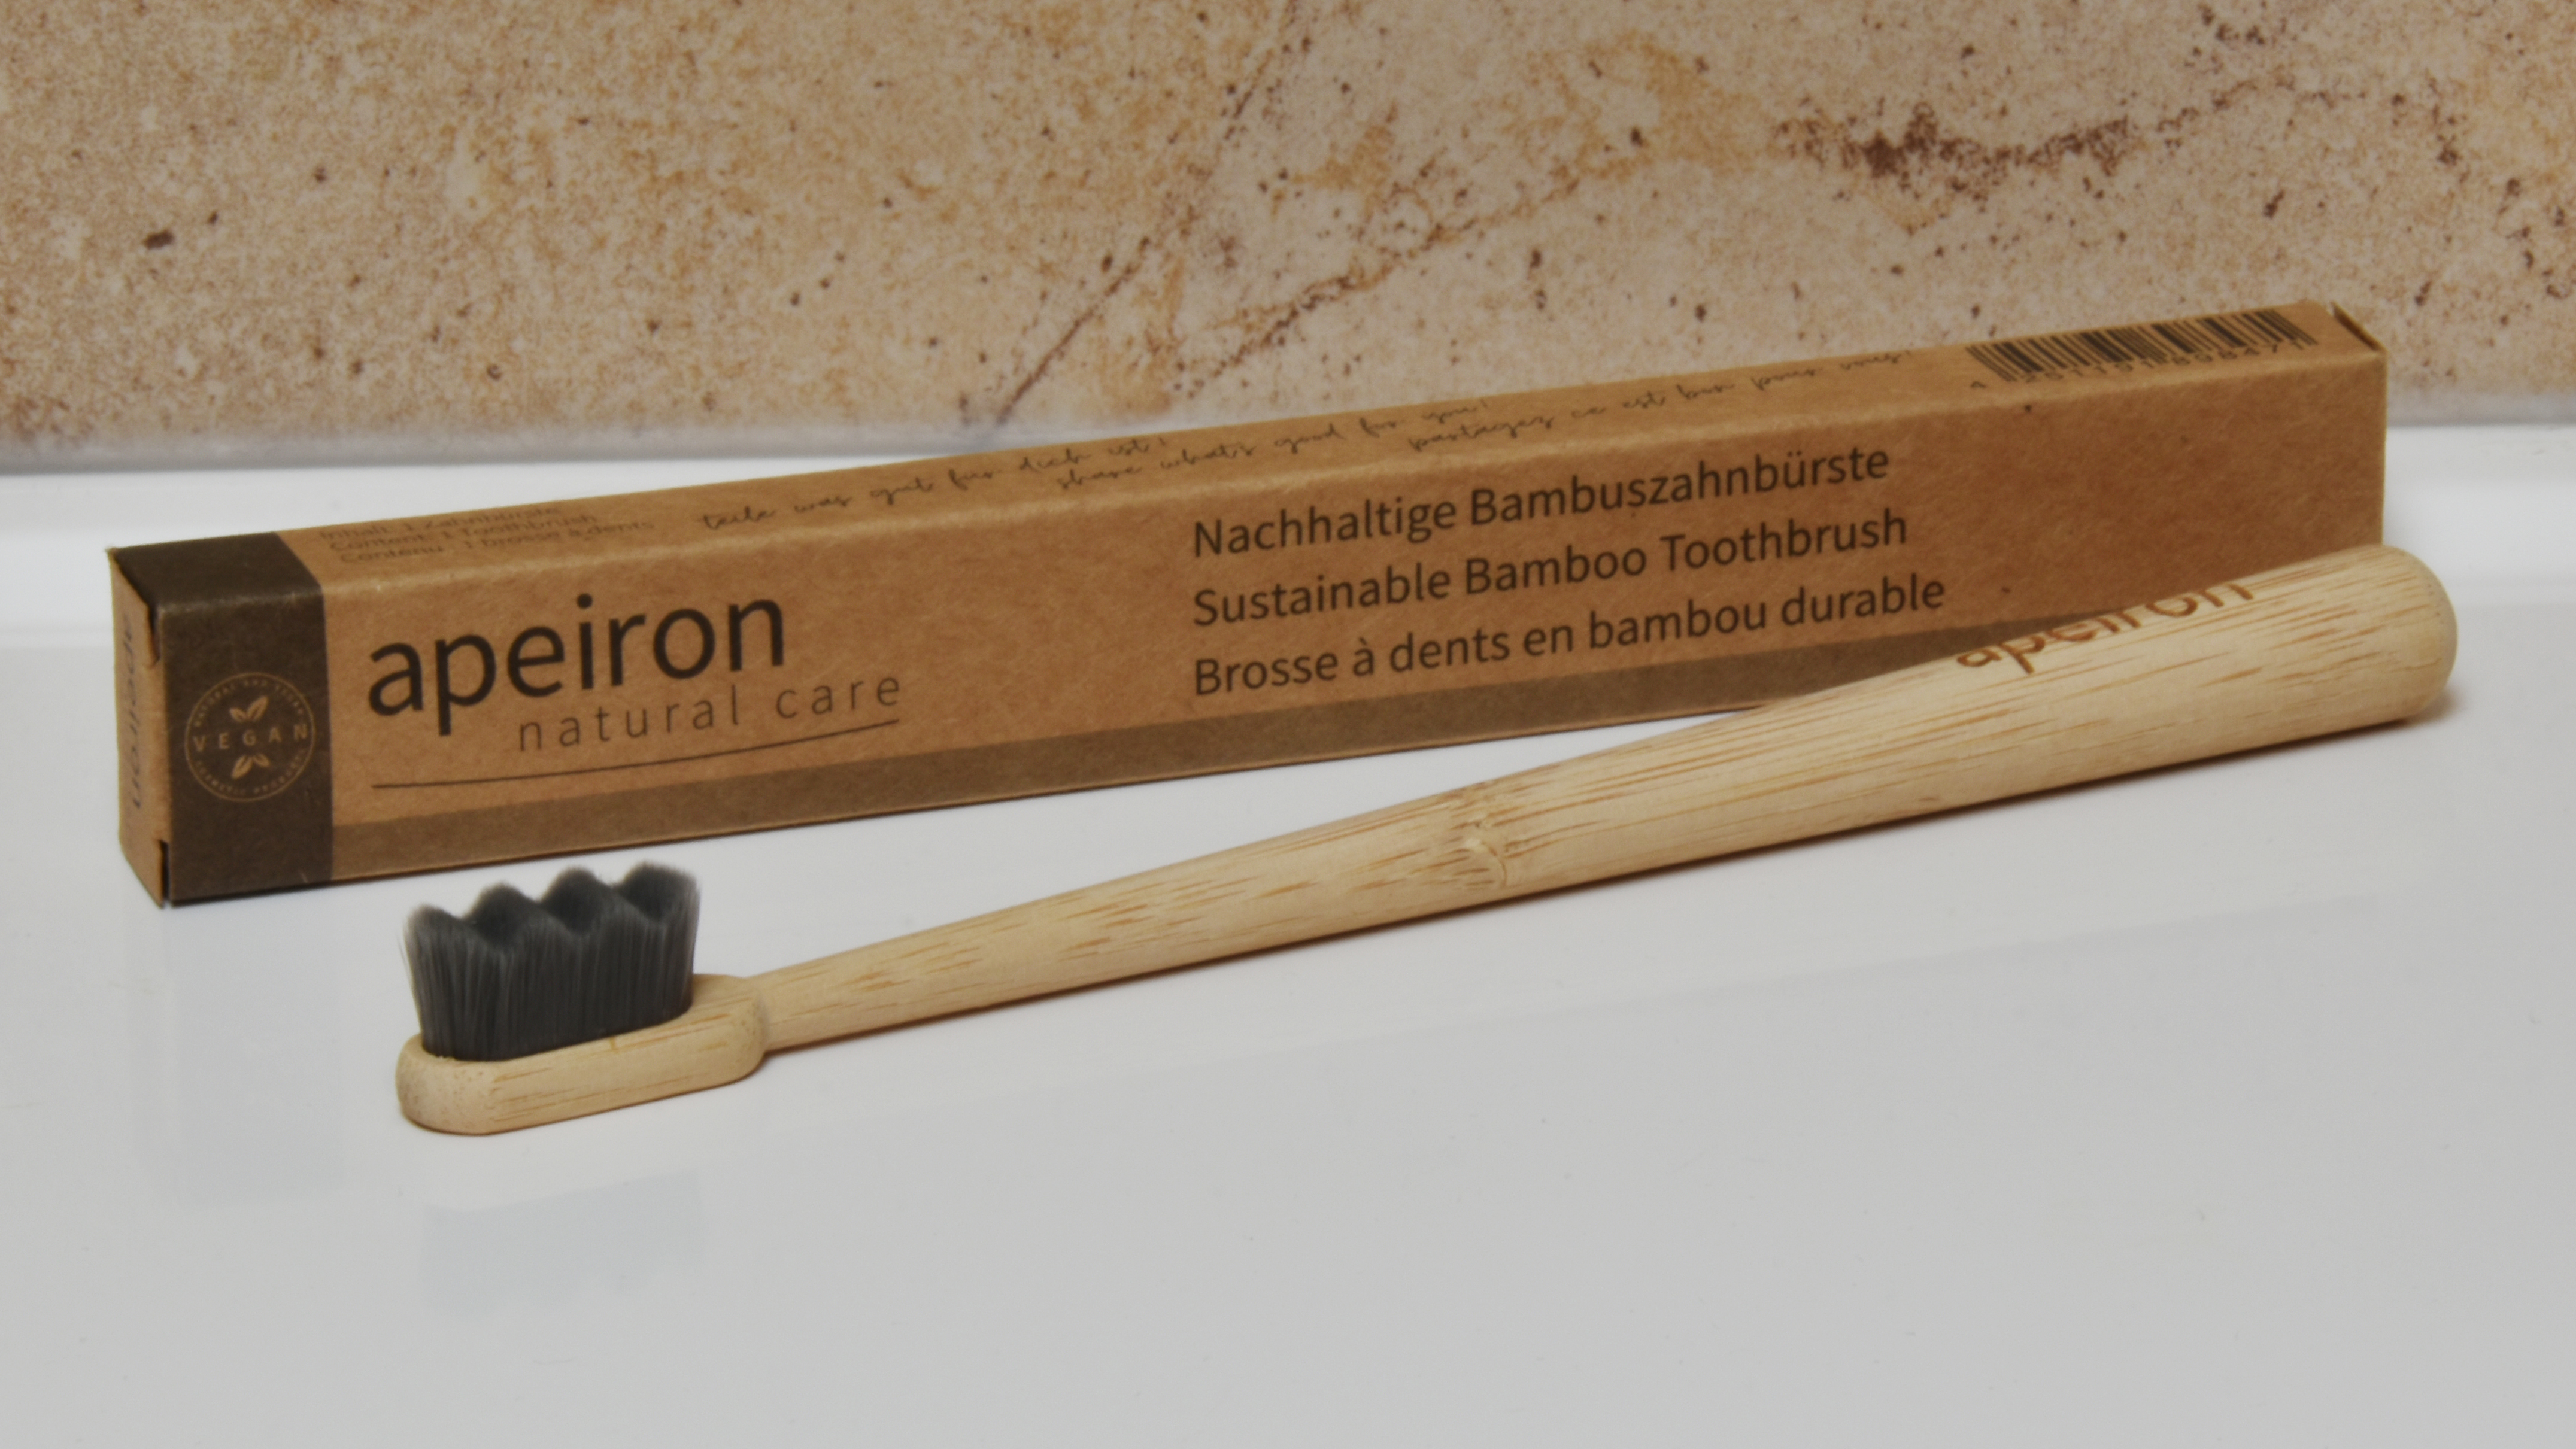 Apeiron FINIDENT Bambus-Zahnbürste, schwarz